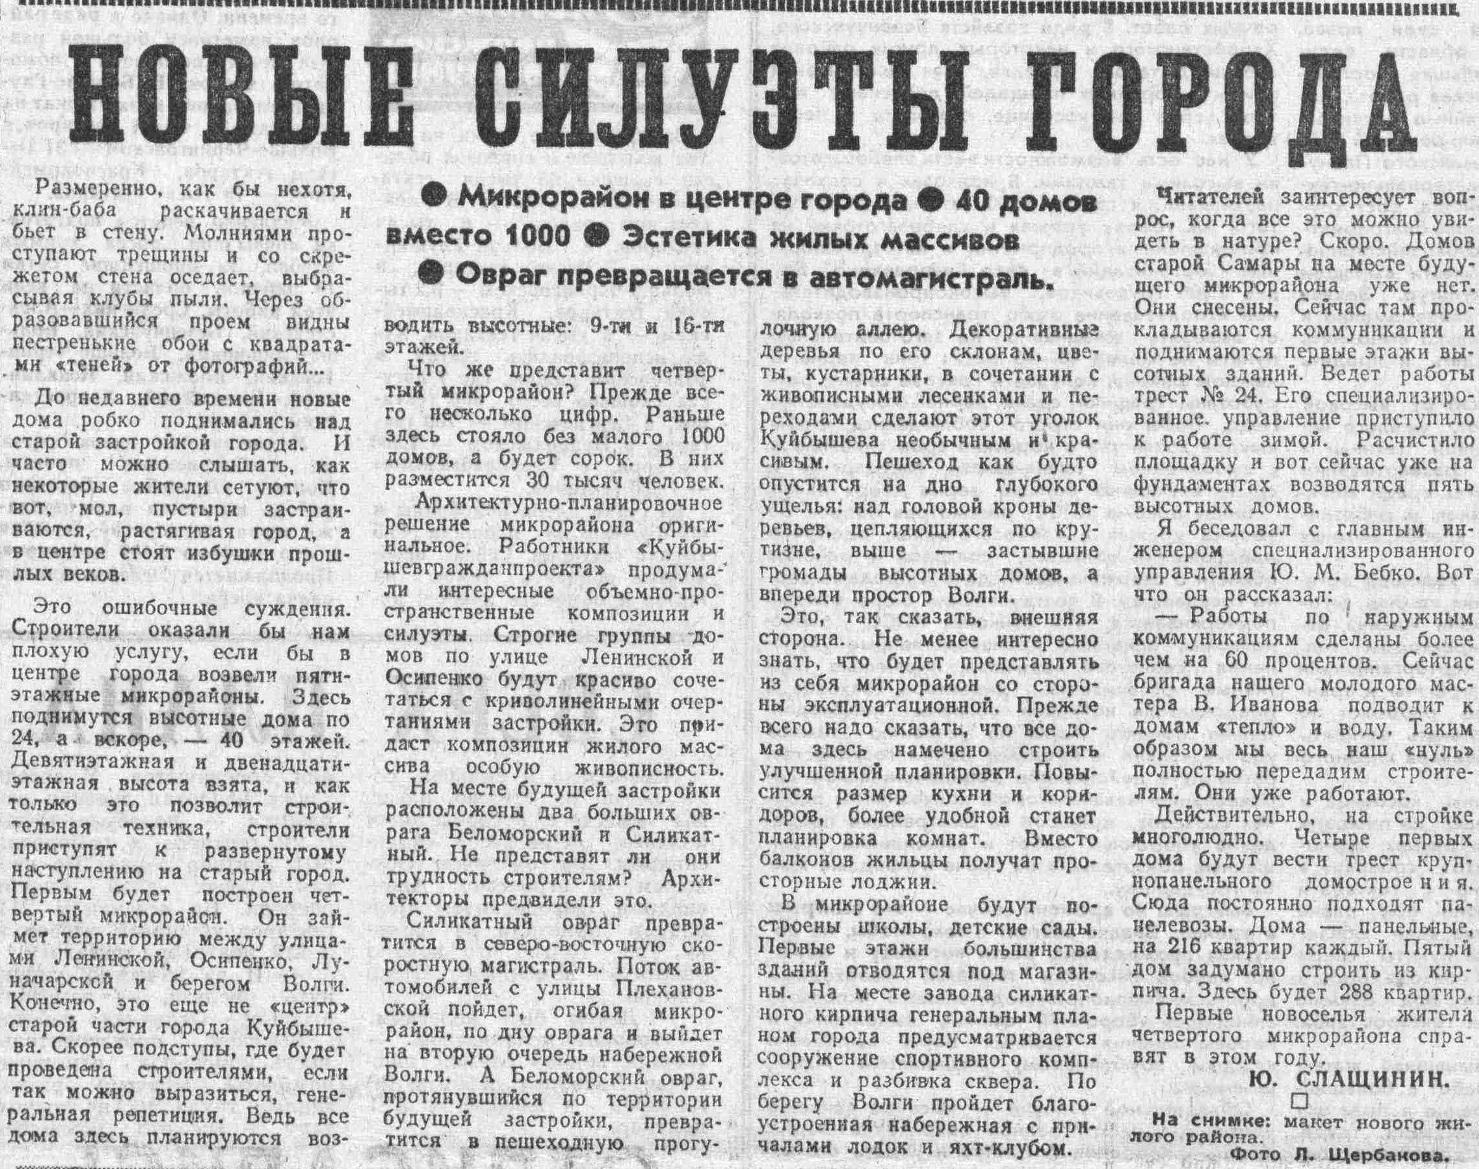 ФОТО-08-Ленина-ВКа-1968-08-08-планы IV мкр. - копия